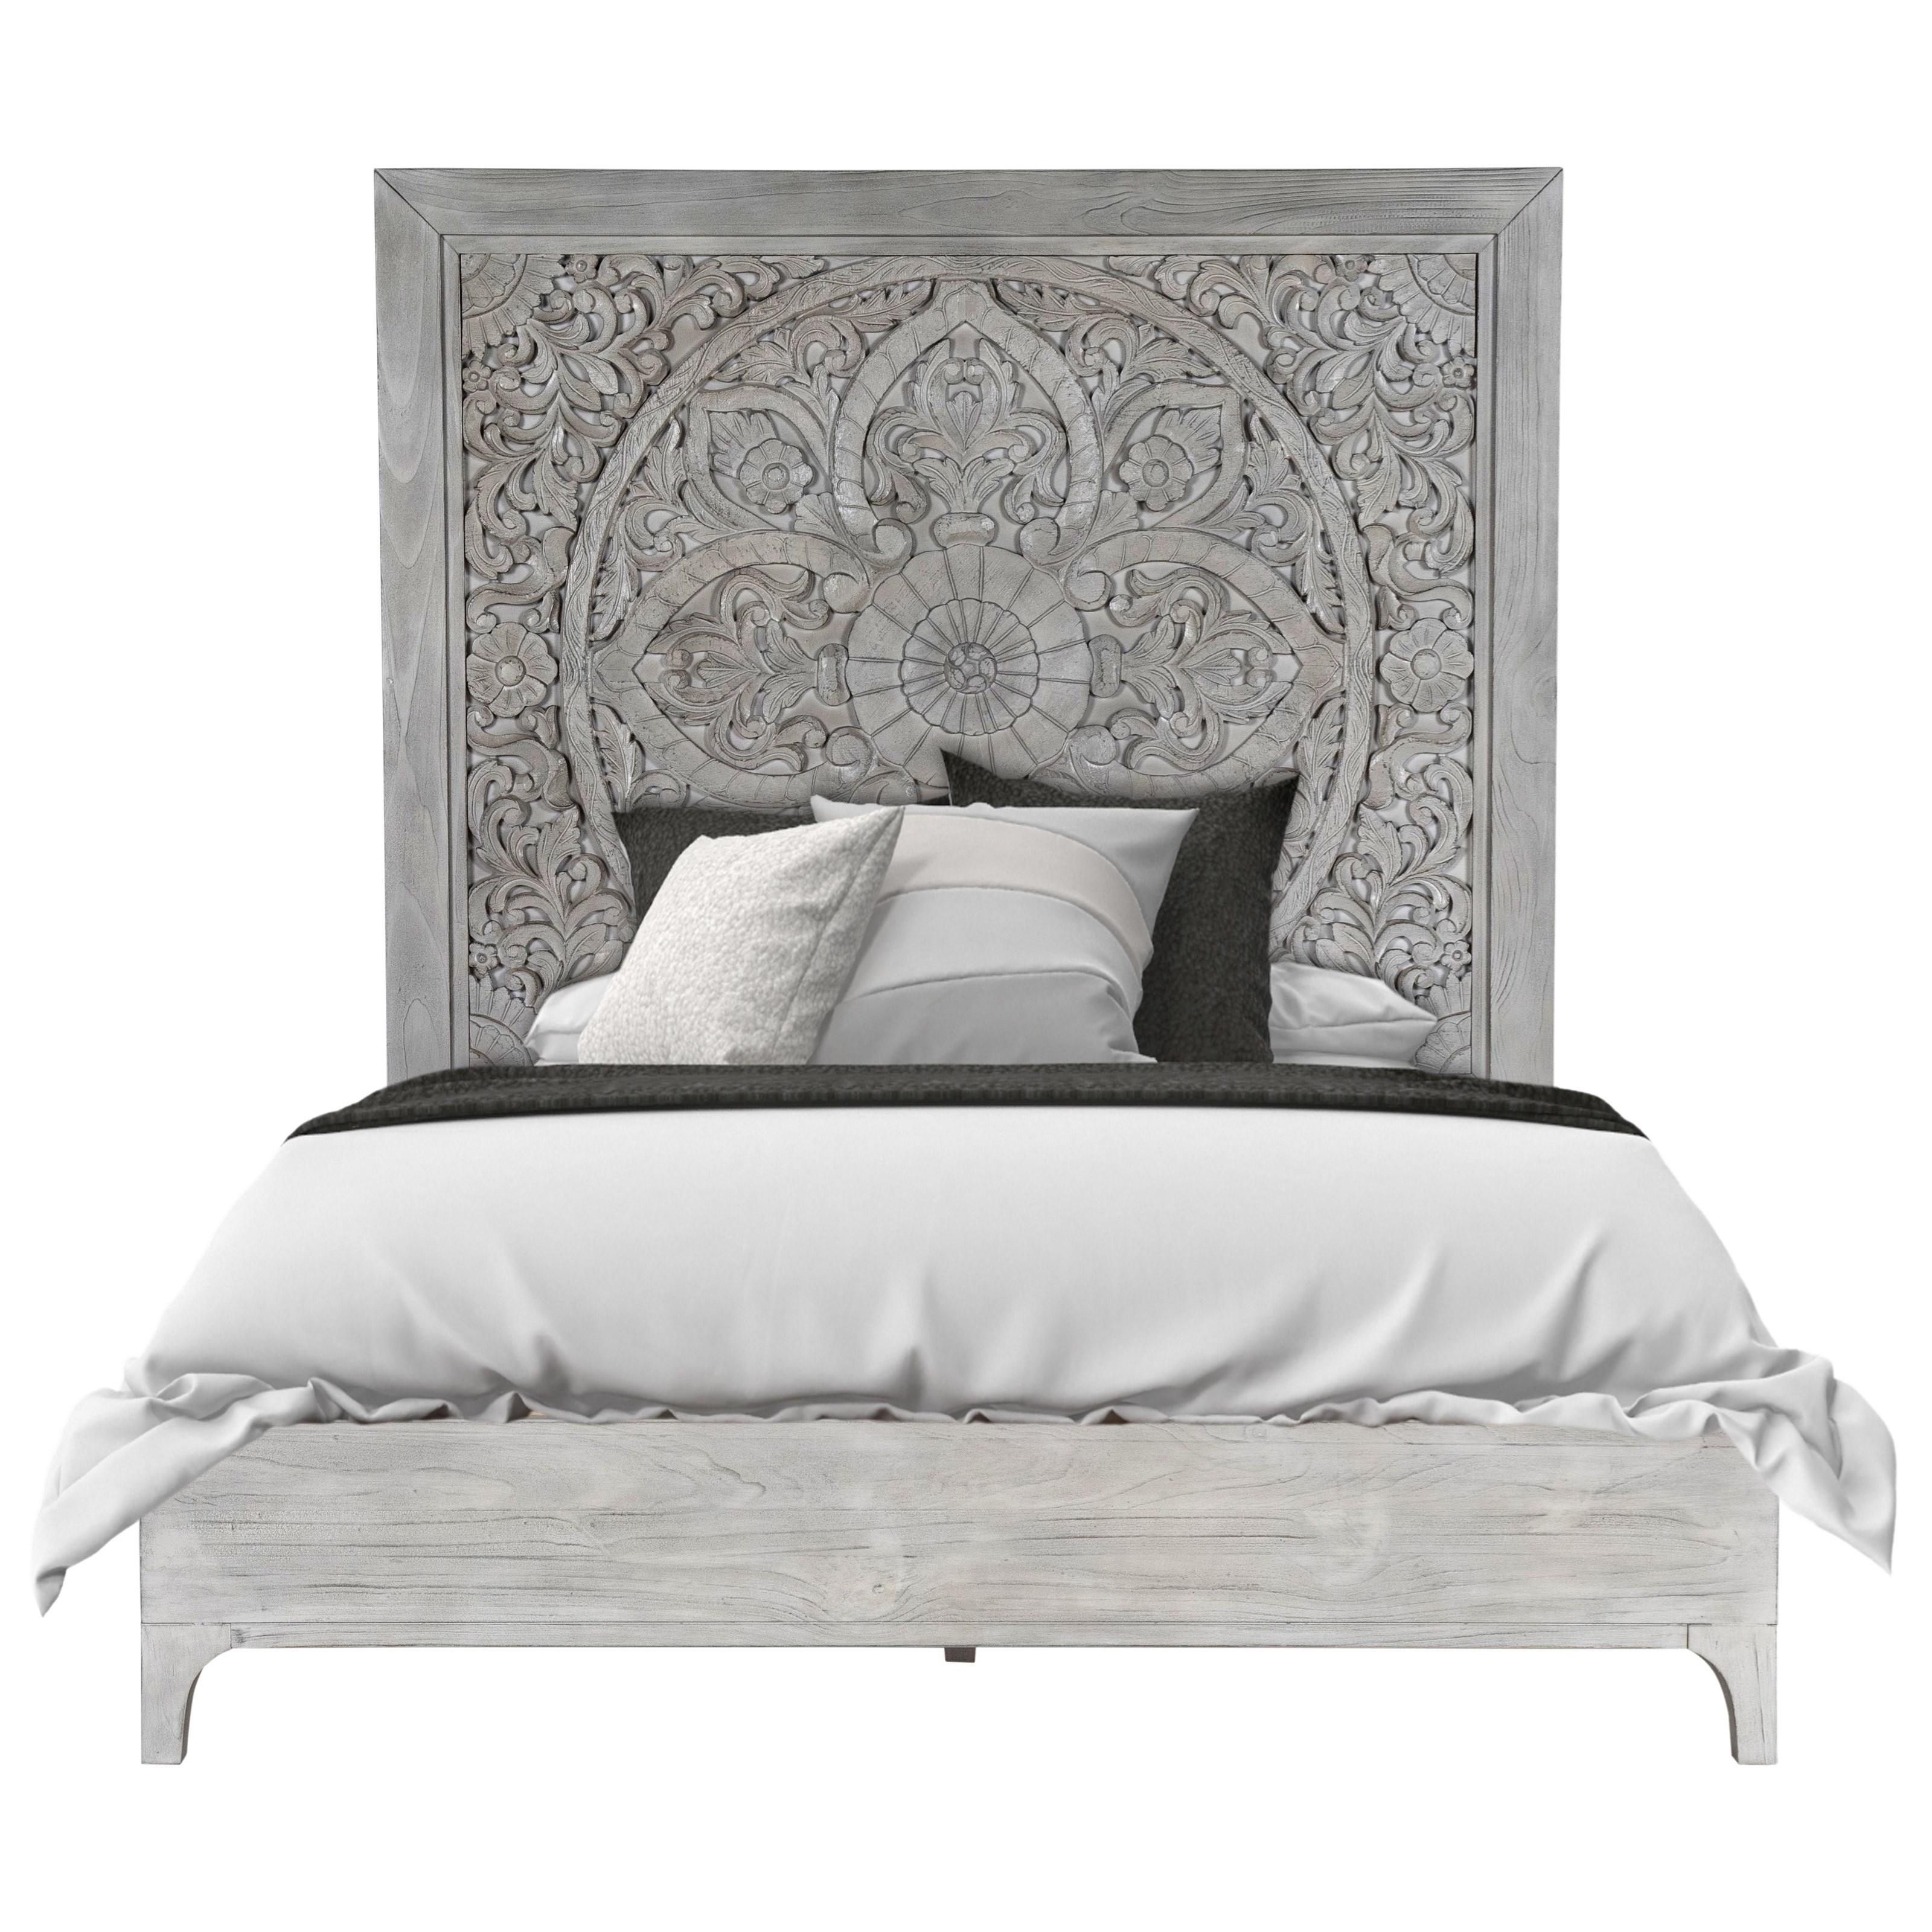 Boho Chic California King Platform Bed in Washed White at Sadler's Home Furnishings